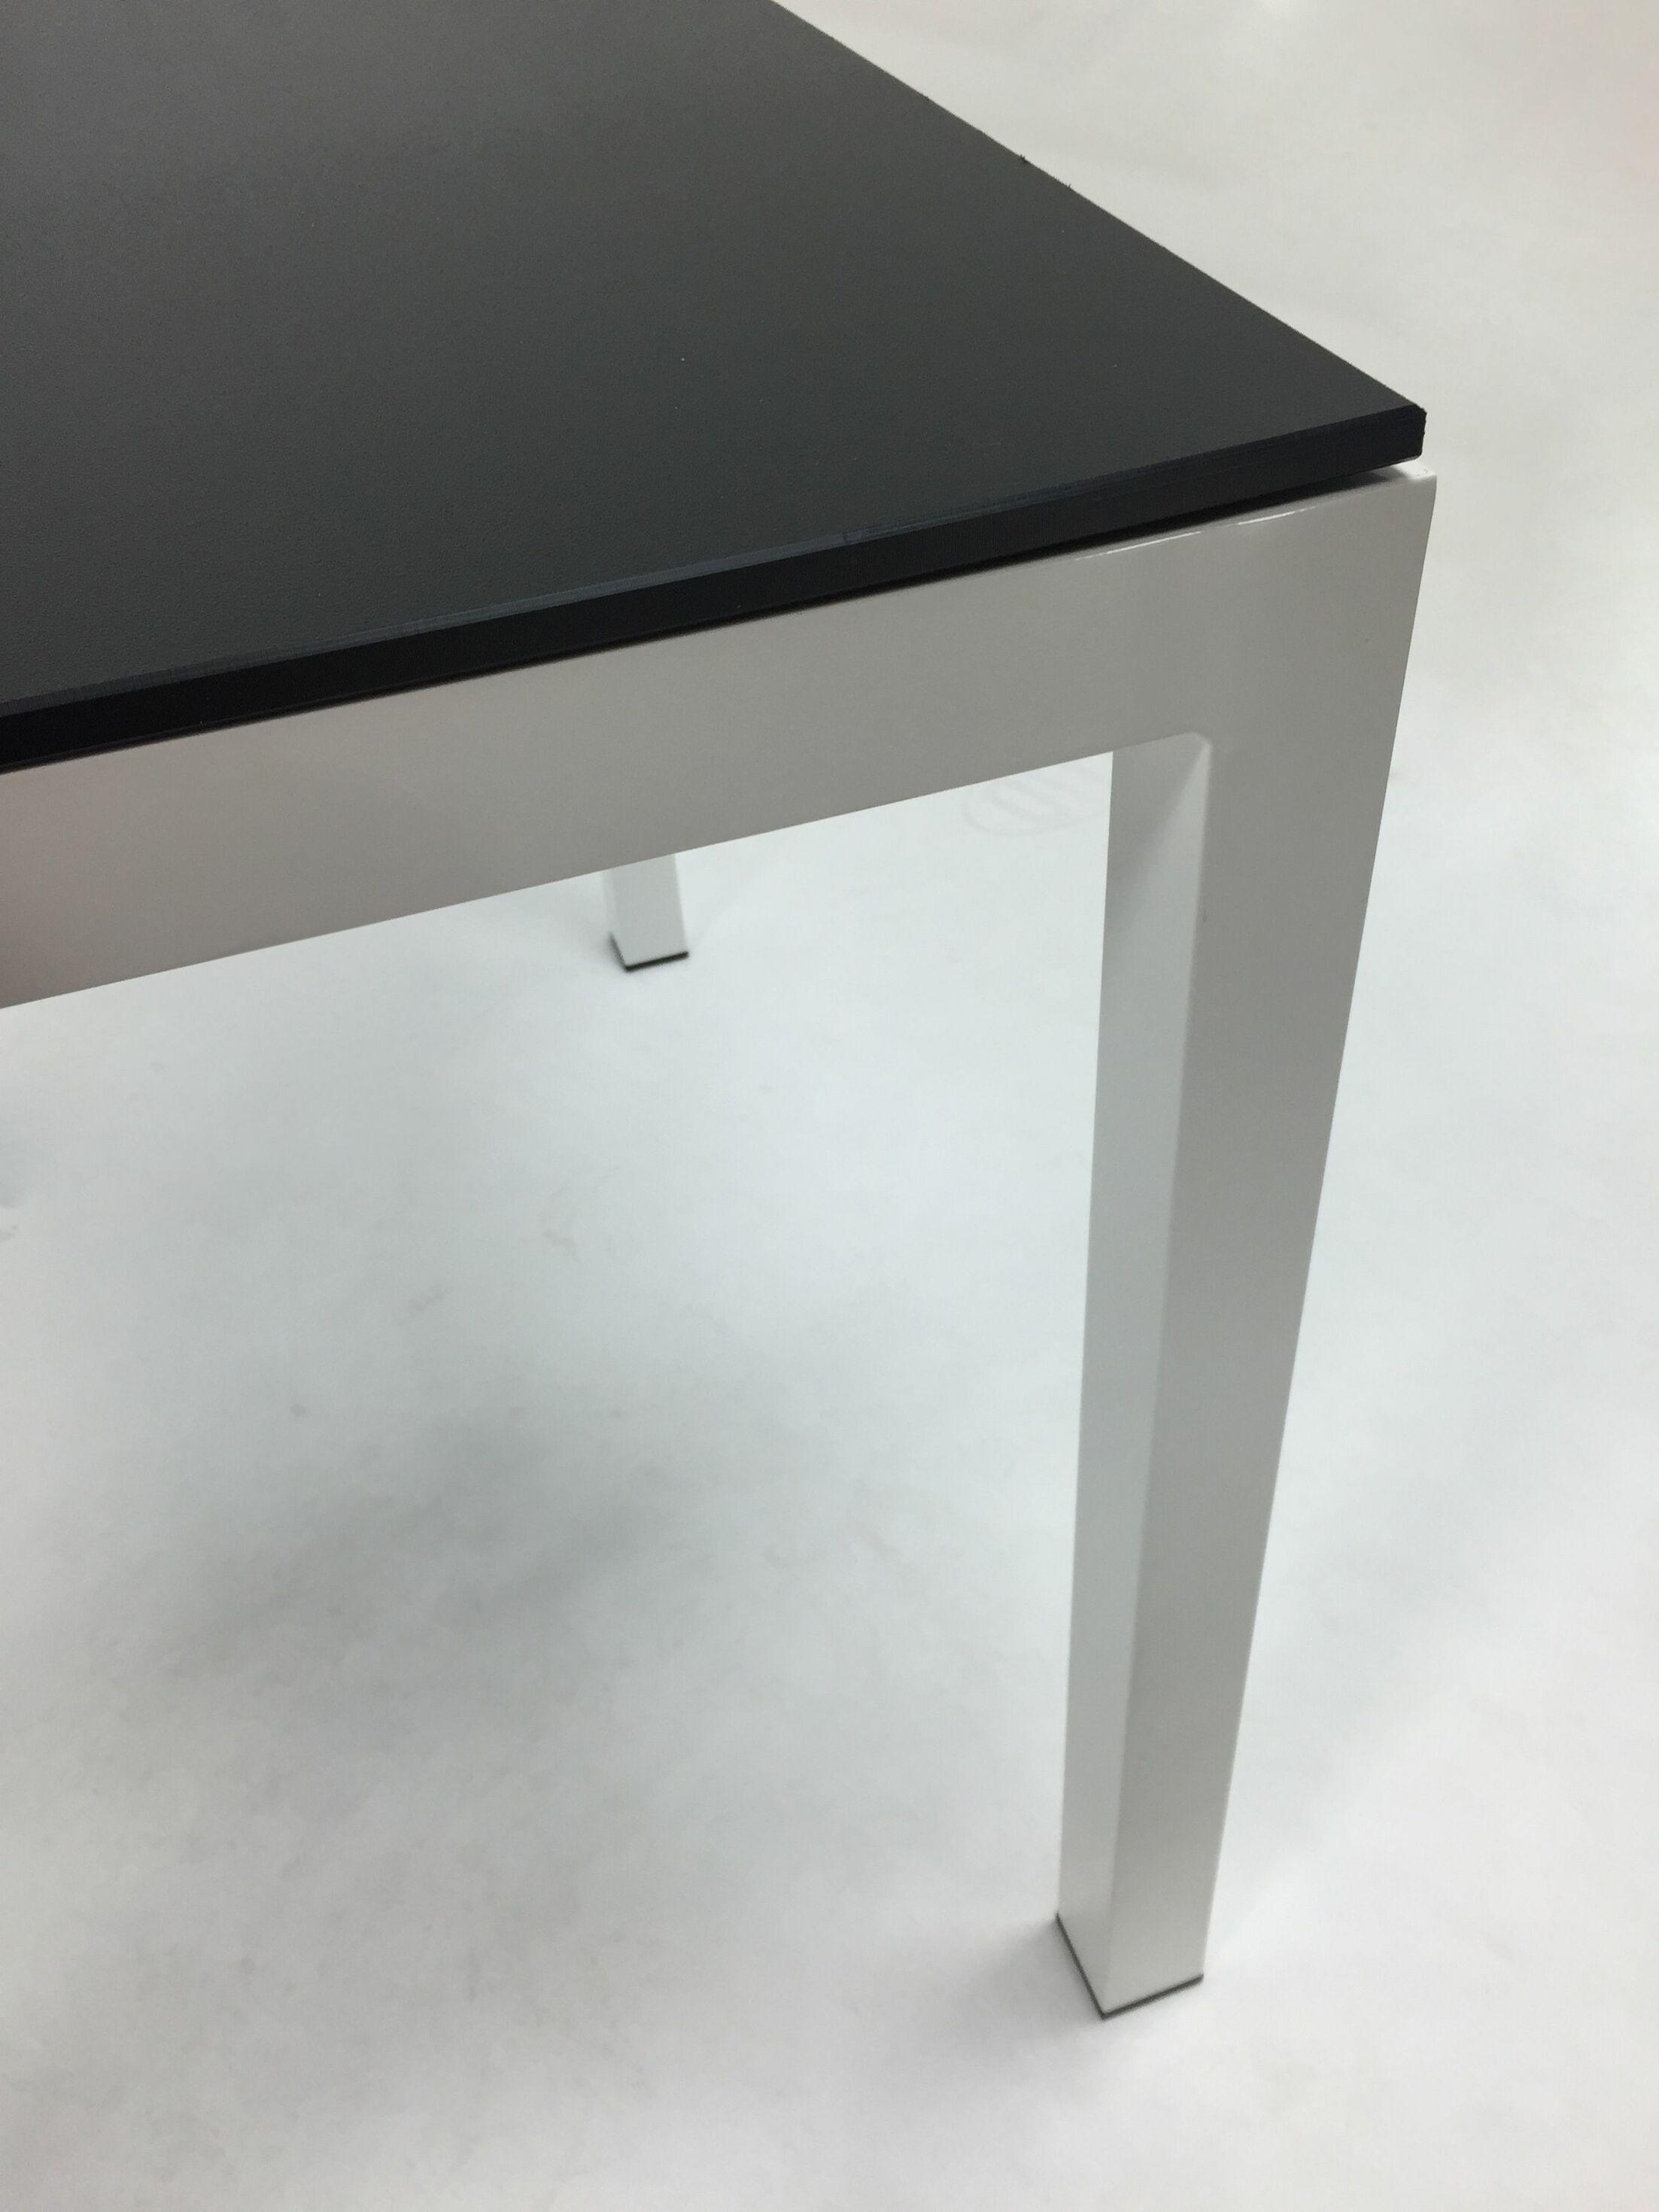 Jug Dining Table Frame Finish: White, Top Finish: Blue